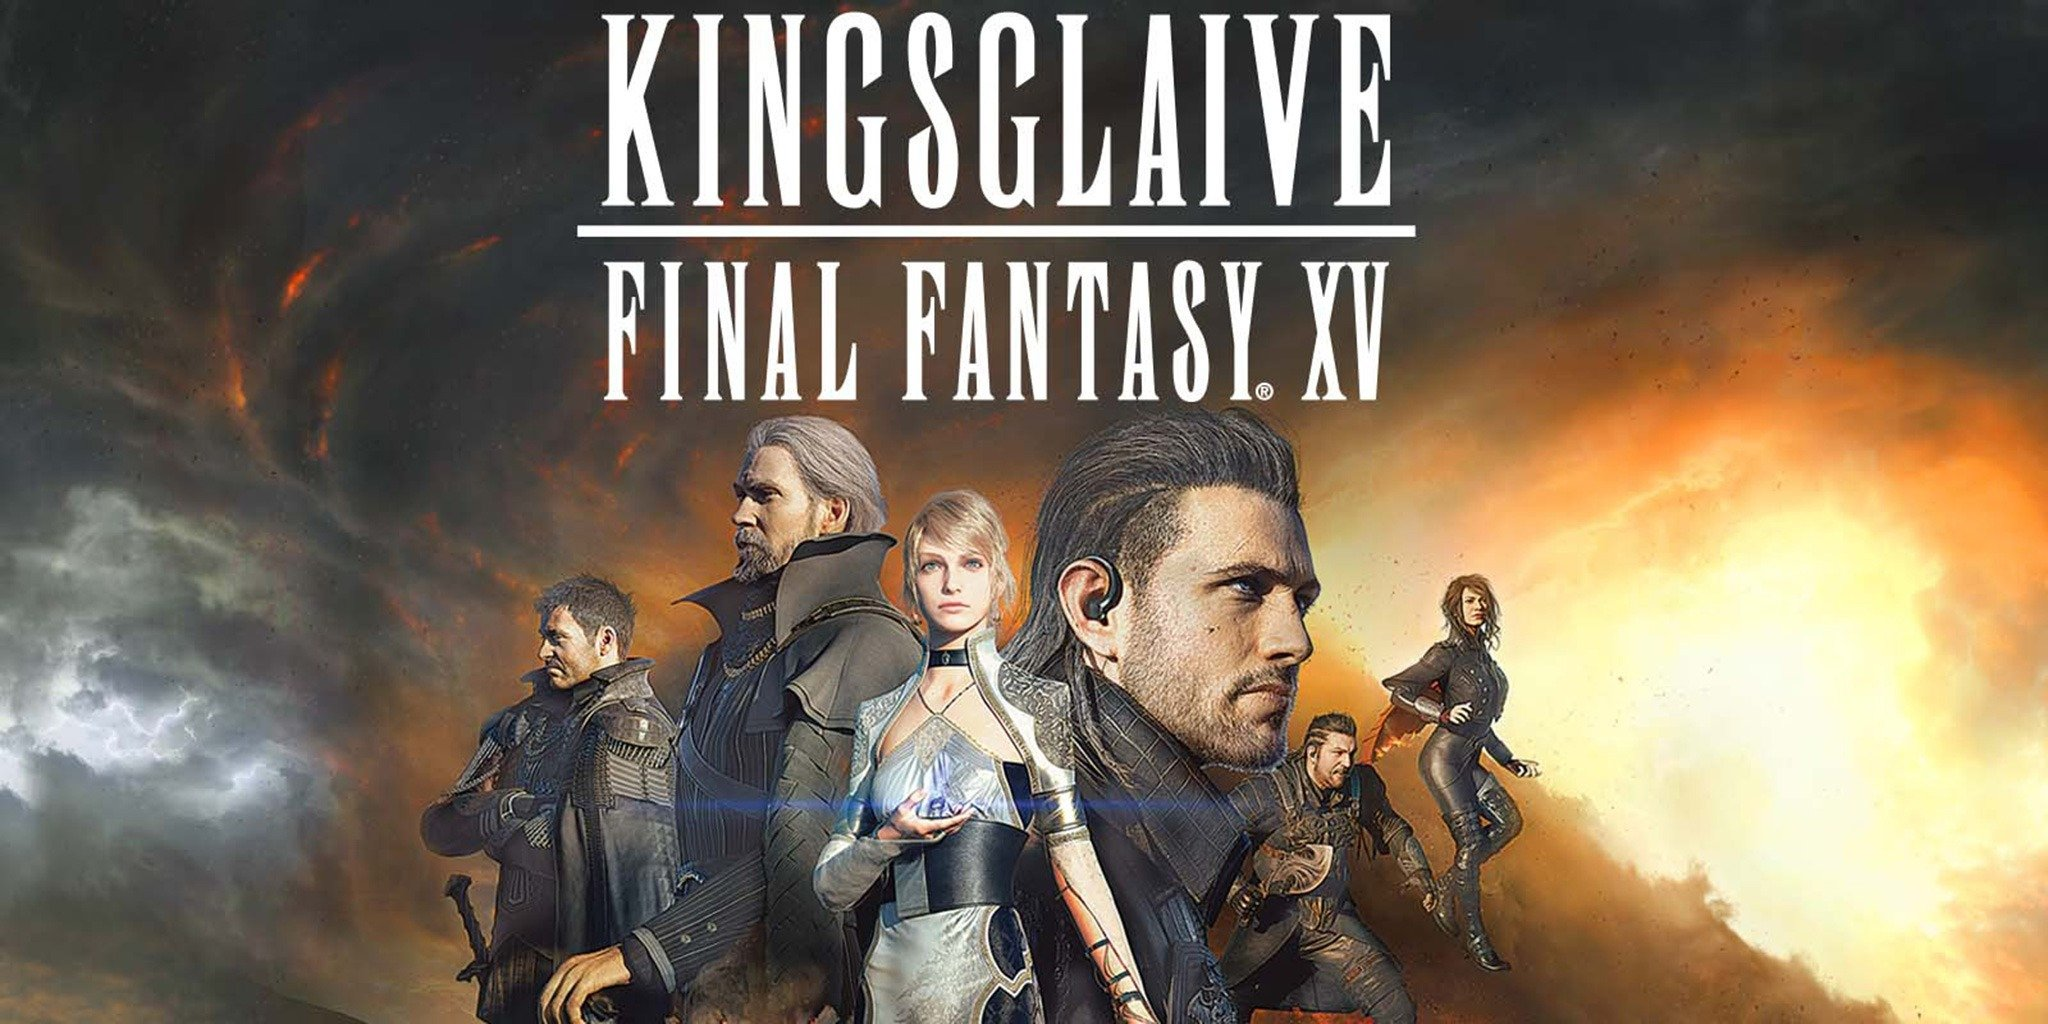 kingsglaive-final-fantasy-xv_animation-movies